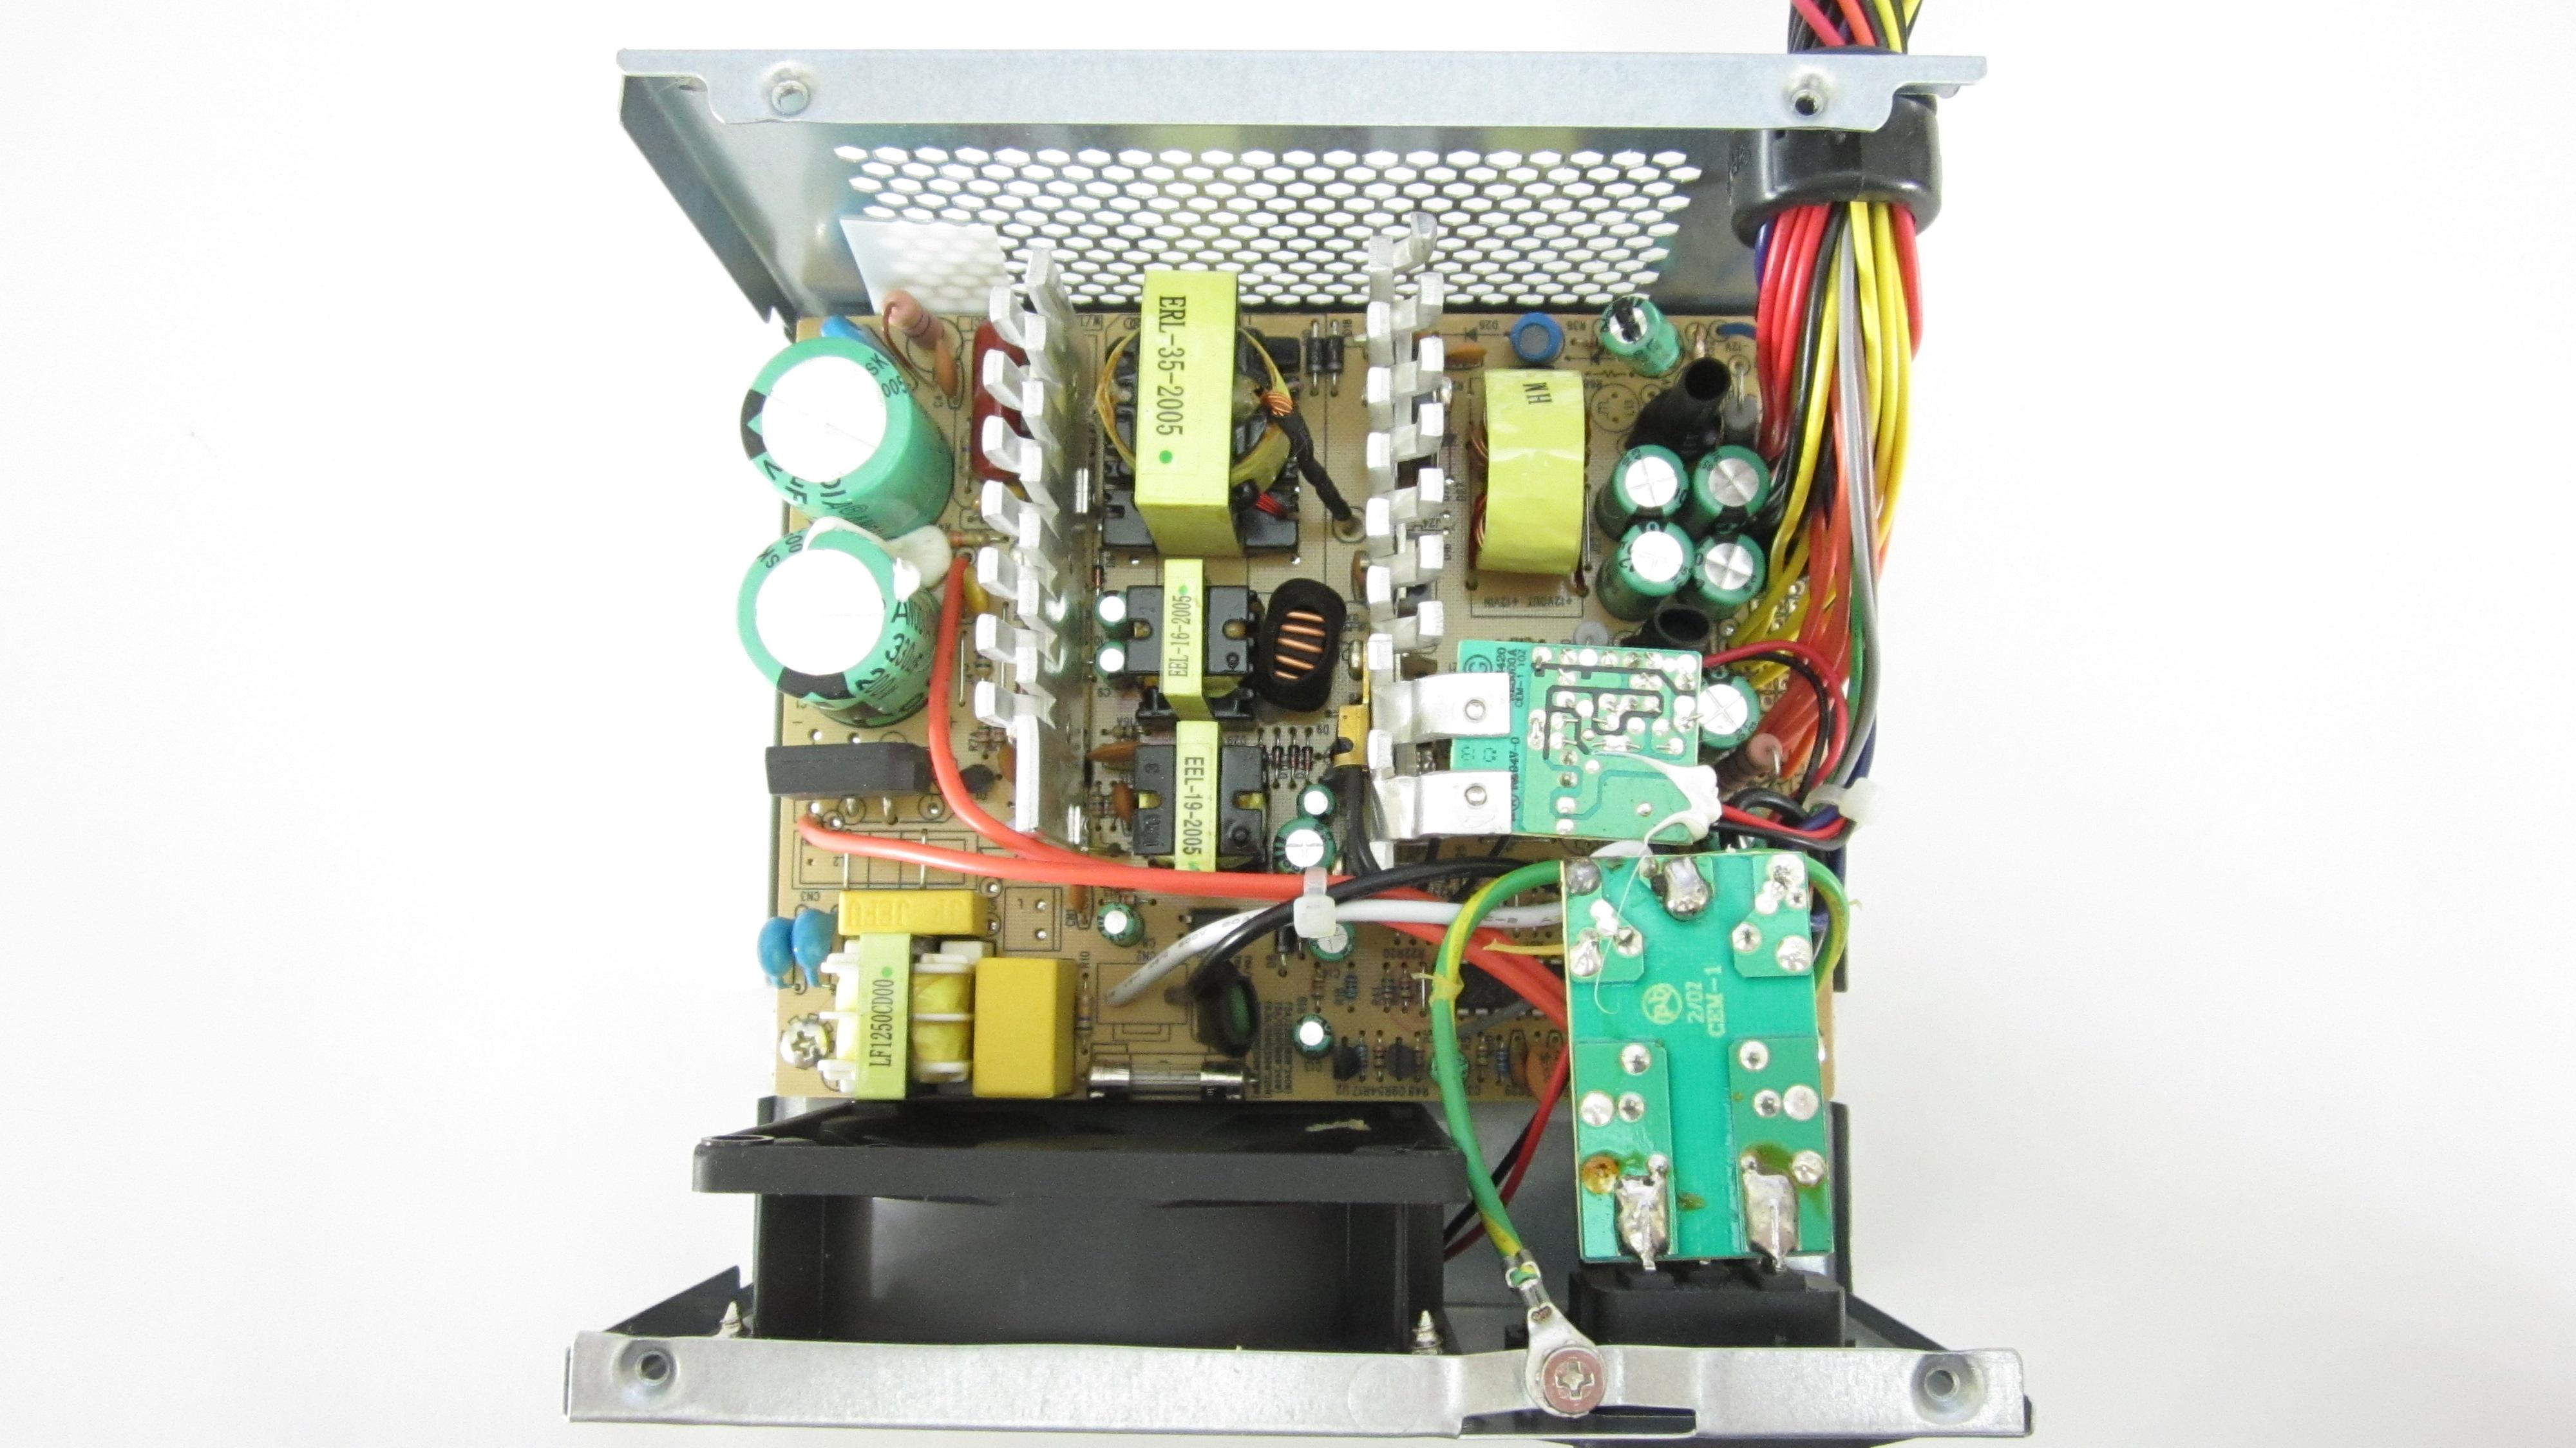 With Arduino Power Supply On Wiring Diagram Computer Binarytobcddecoder And Tutorials Digital Systems Part 4 Turn A Into Bench Make Rh Makezine Com